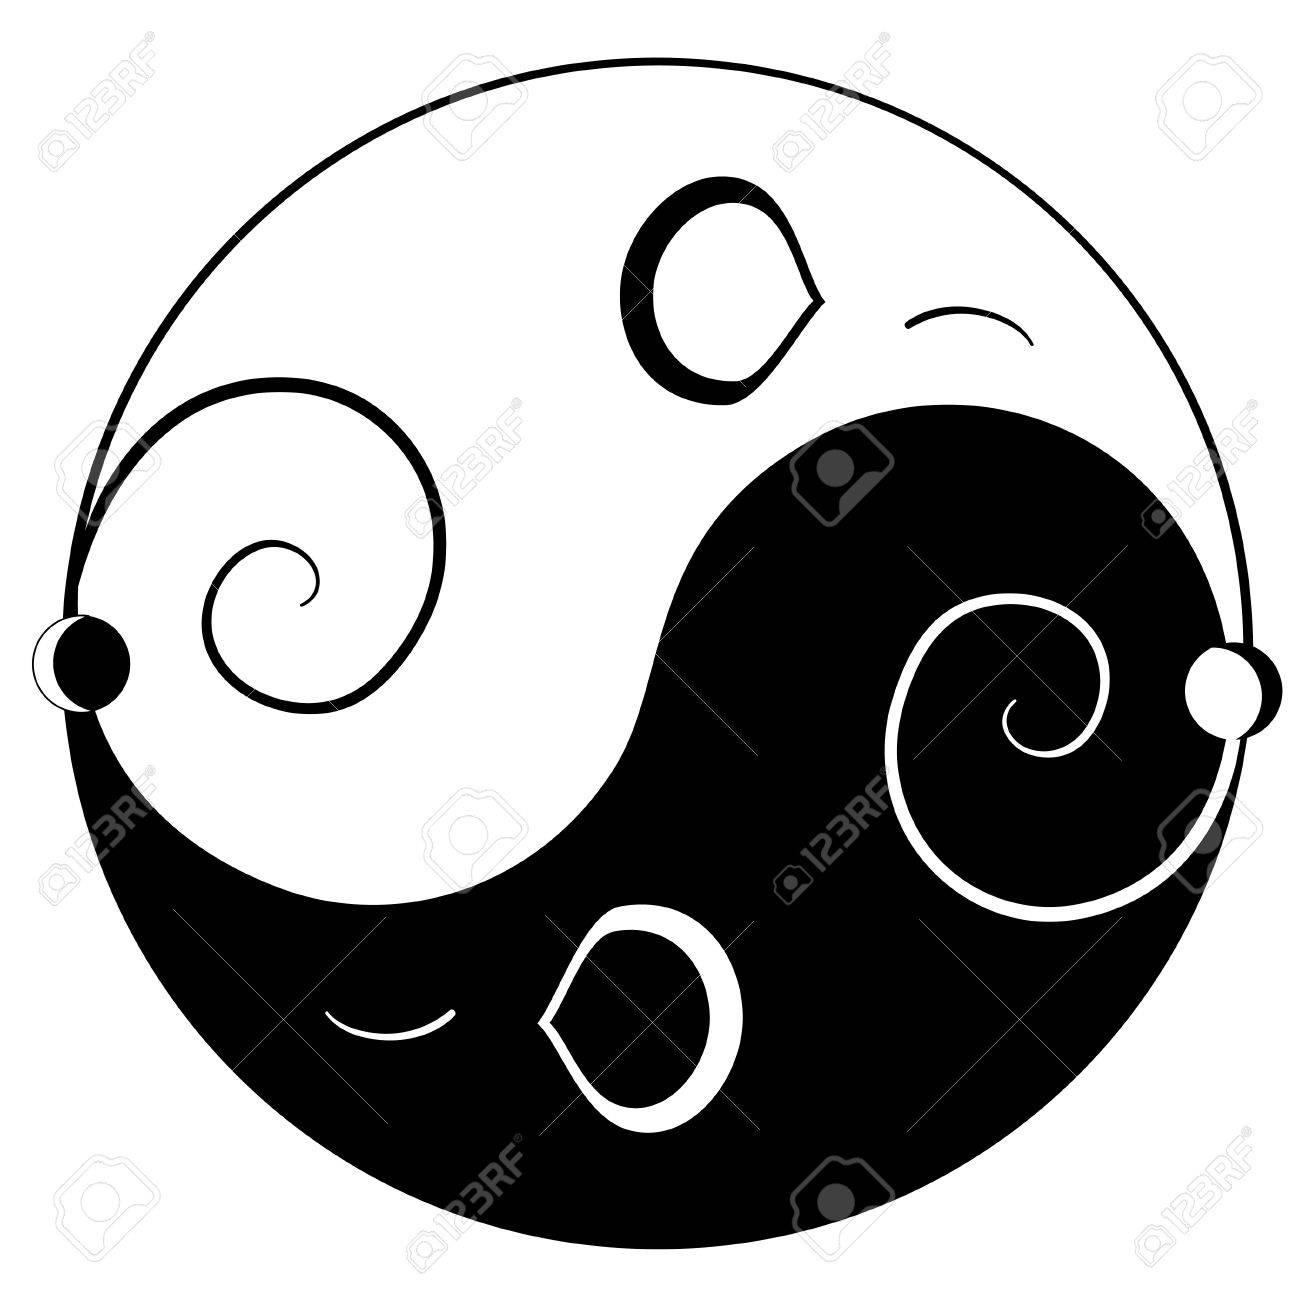 Mouse ying yang symbol of harmony and balance Stock Vector - 13214714